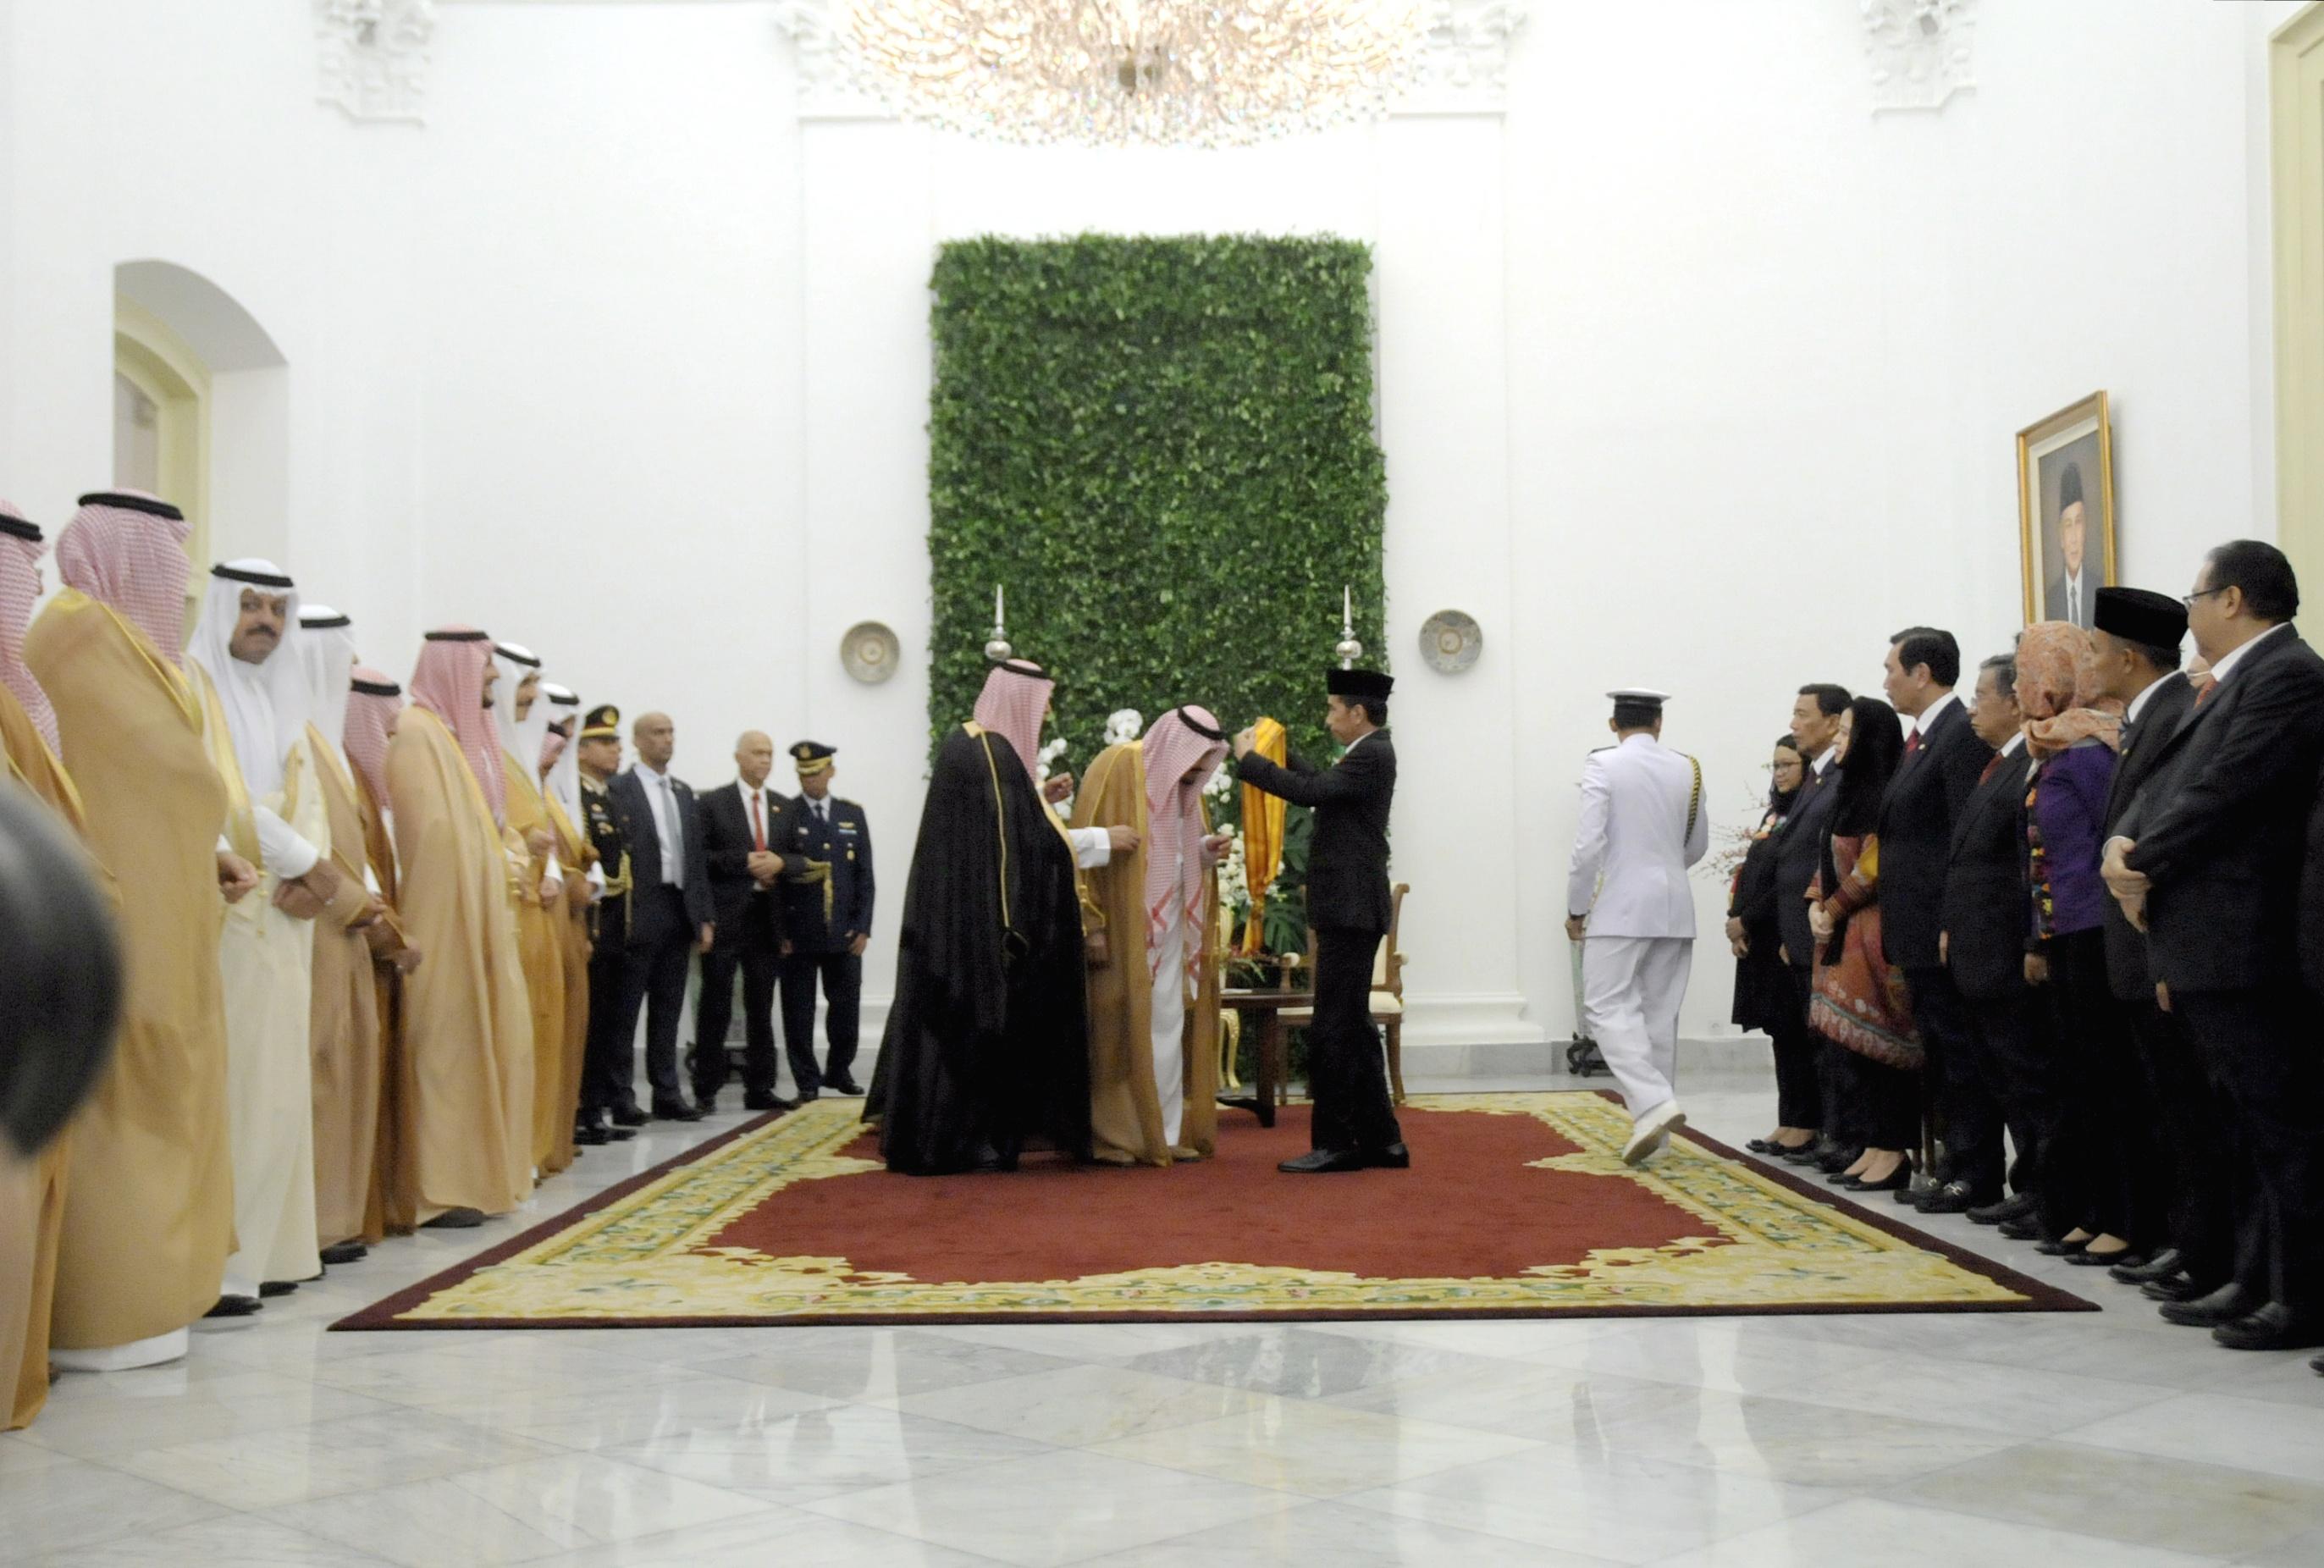 Presiden Jokowi menganugerahkan Tanda Kehormatan Bintang Republik Indonesia Adipurna kepada Raja Arab Saudi Salman bin Abdul Aziz al-Saud, di Istana Kepresidenan Bogor, Jawa Barat, Rabu (1/3). (Foto: Humas/Oji)